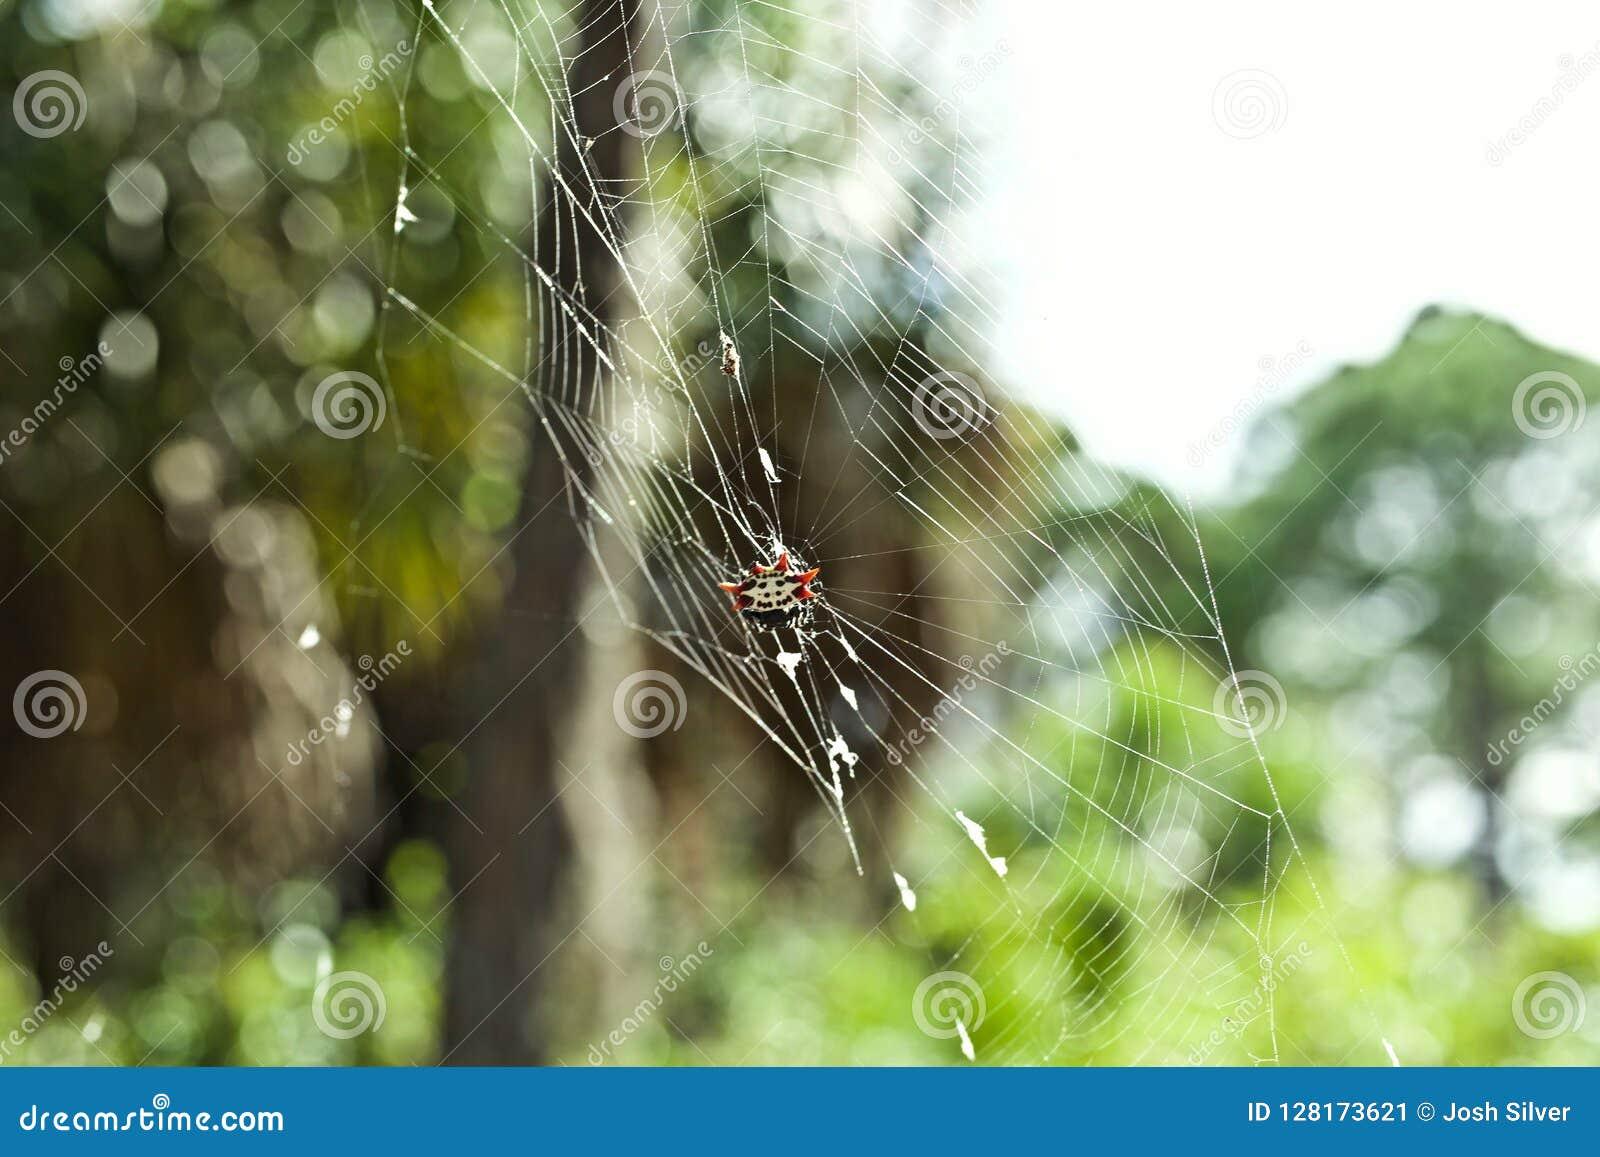 Krabspin in een Web